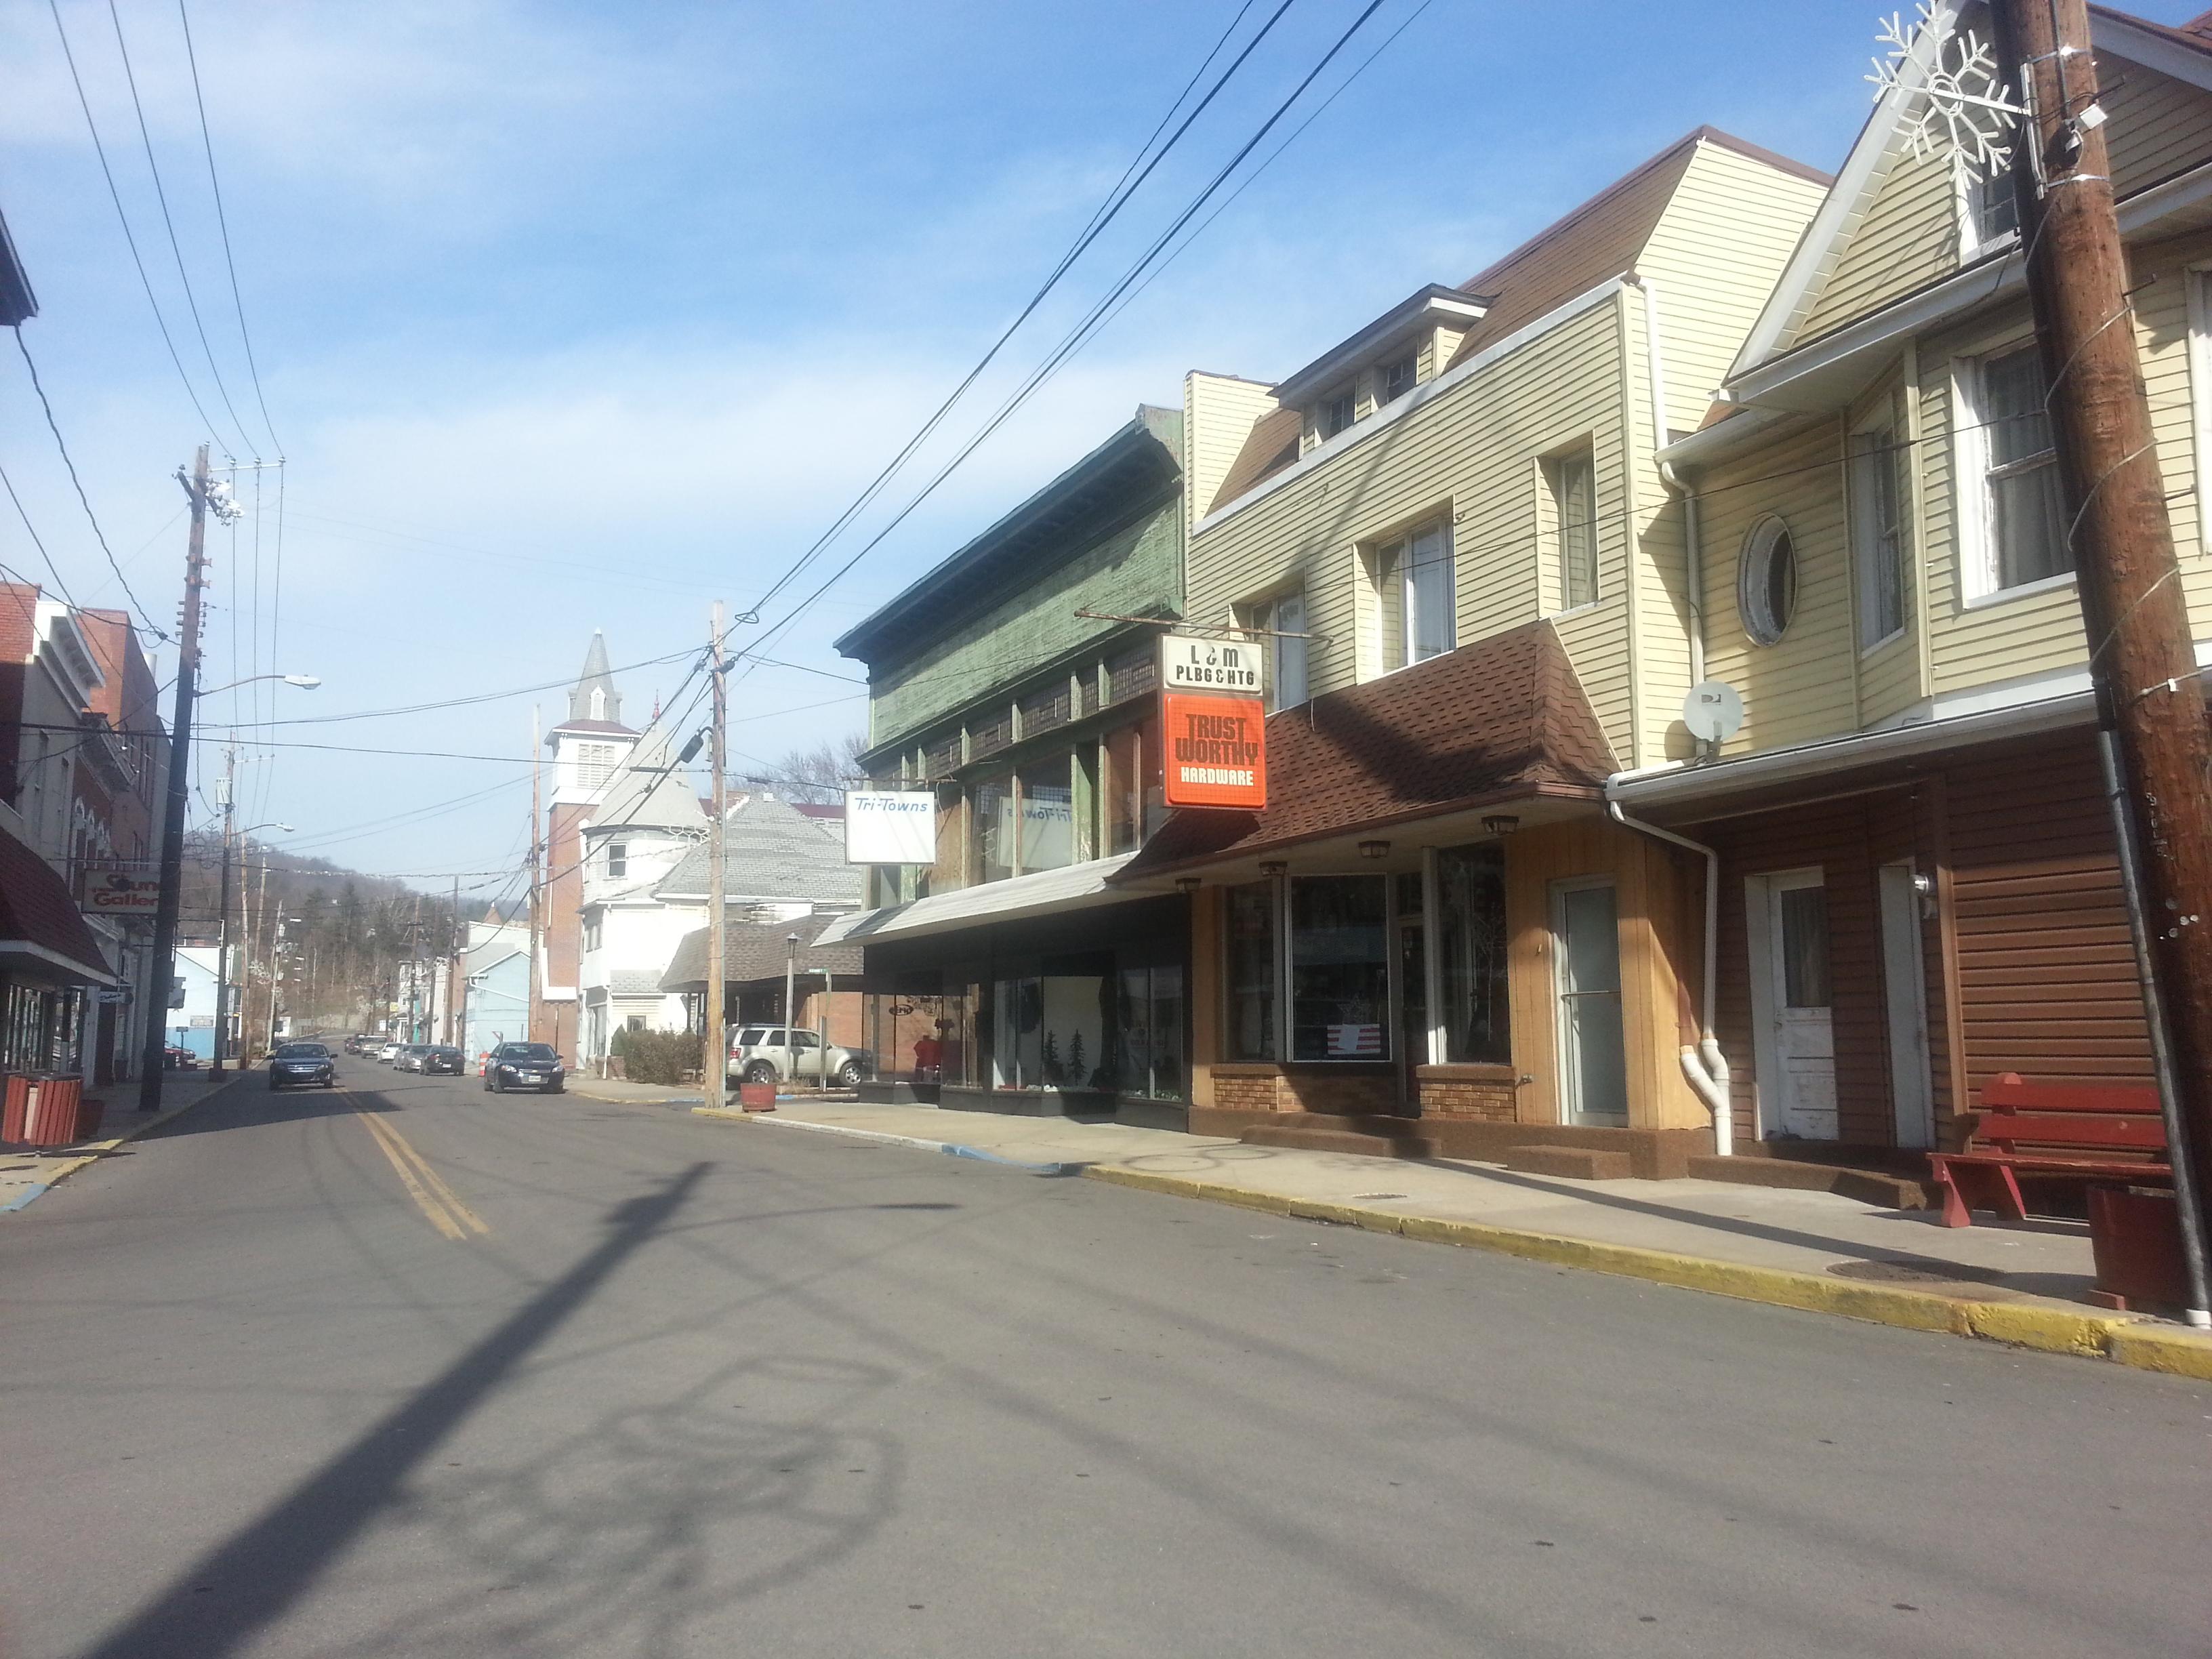 Historic West Virginia town